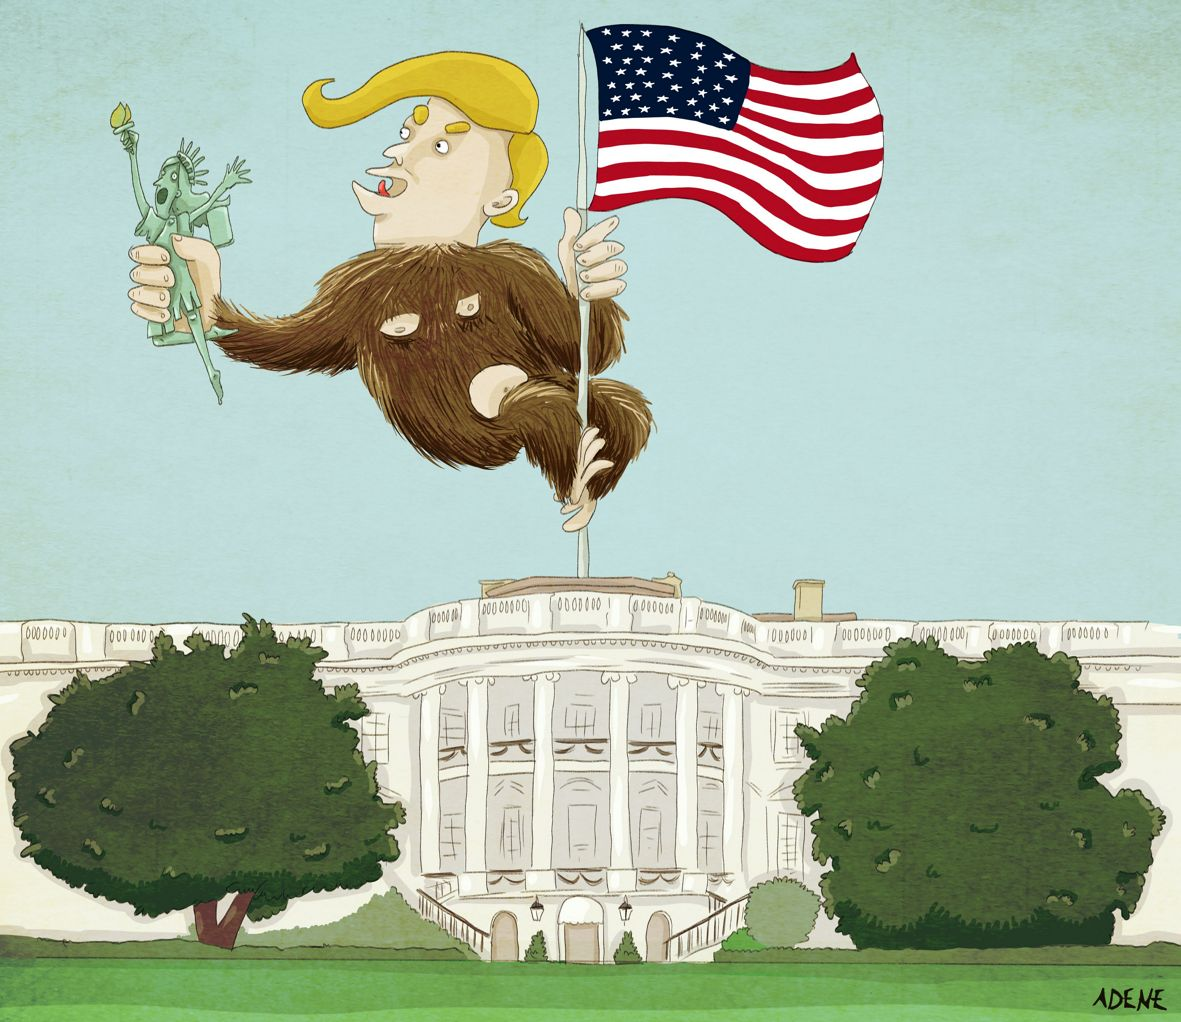 RT @Adenecartoon: #Trump in the #WhiteHouse #cartoon #Dessindepresse #TrumpInaugural #Viñeta https://t.co/fABvPQx147 https://t.co/fUSsh0hxkF